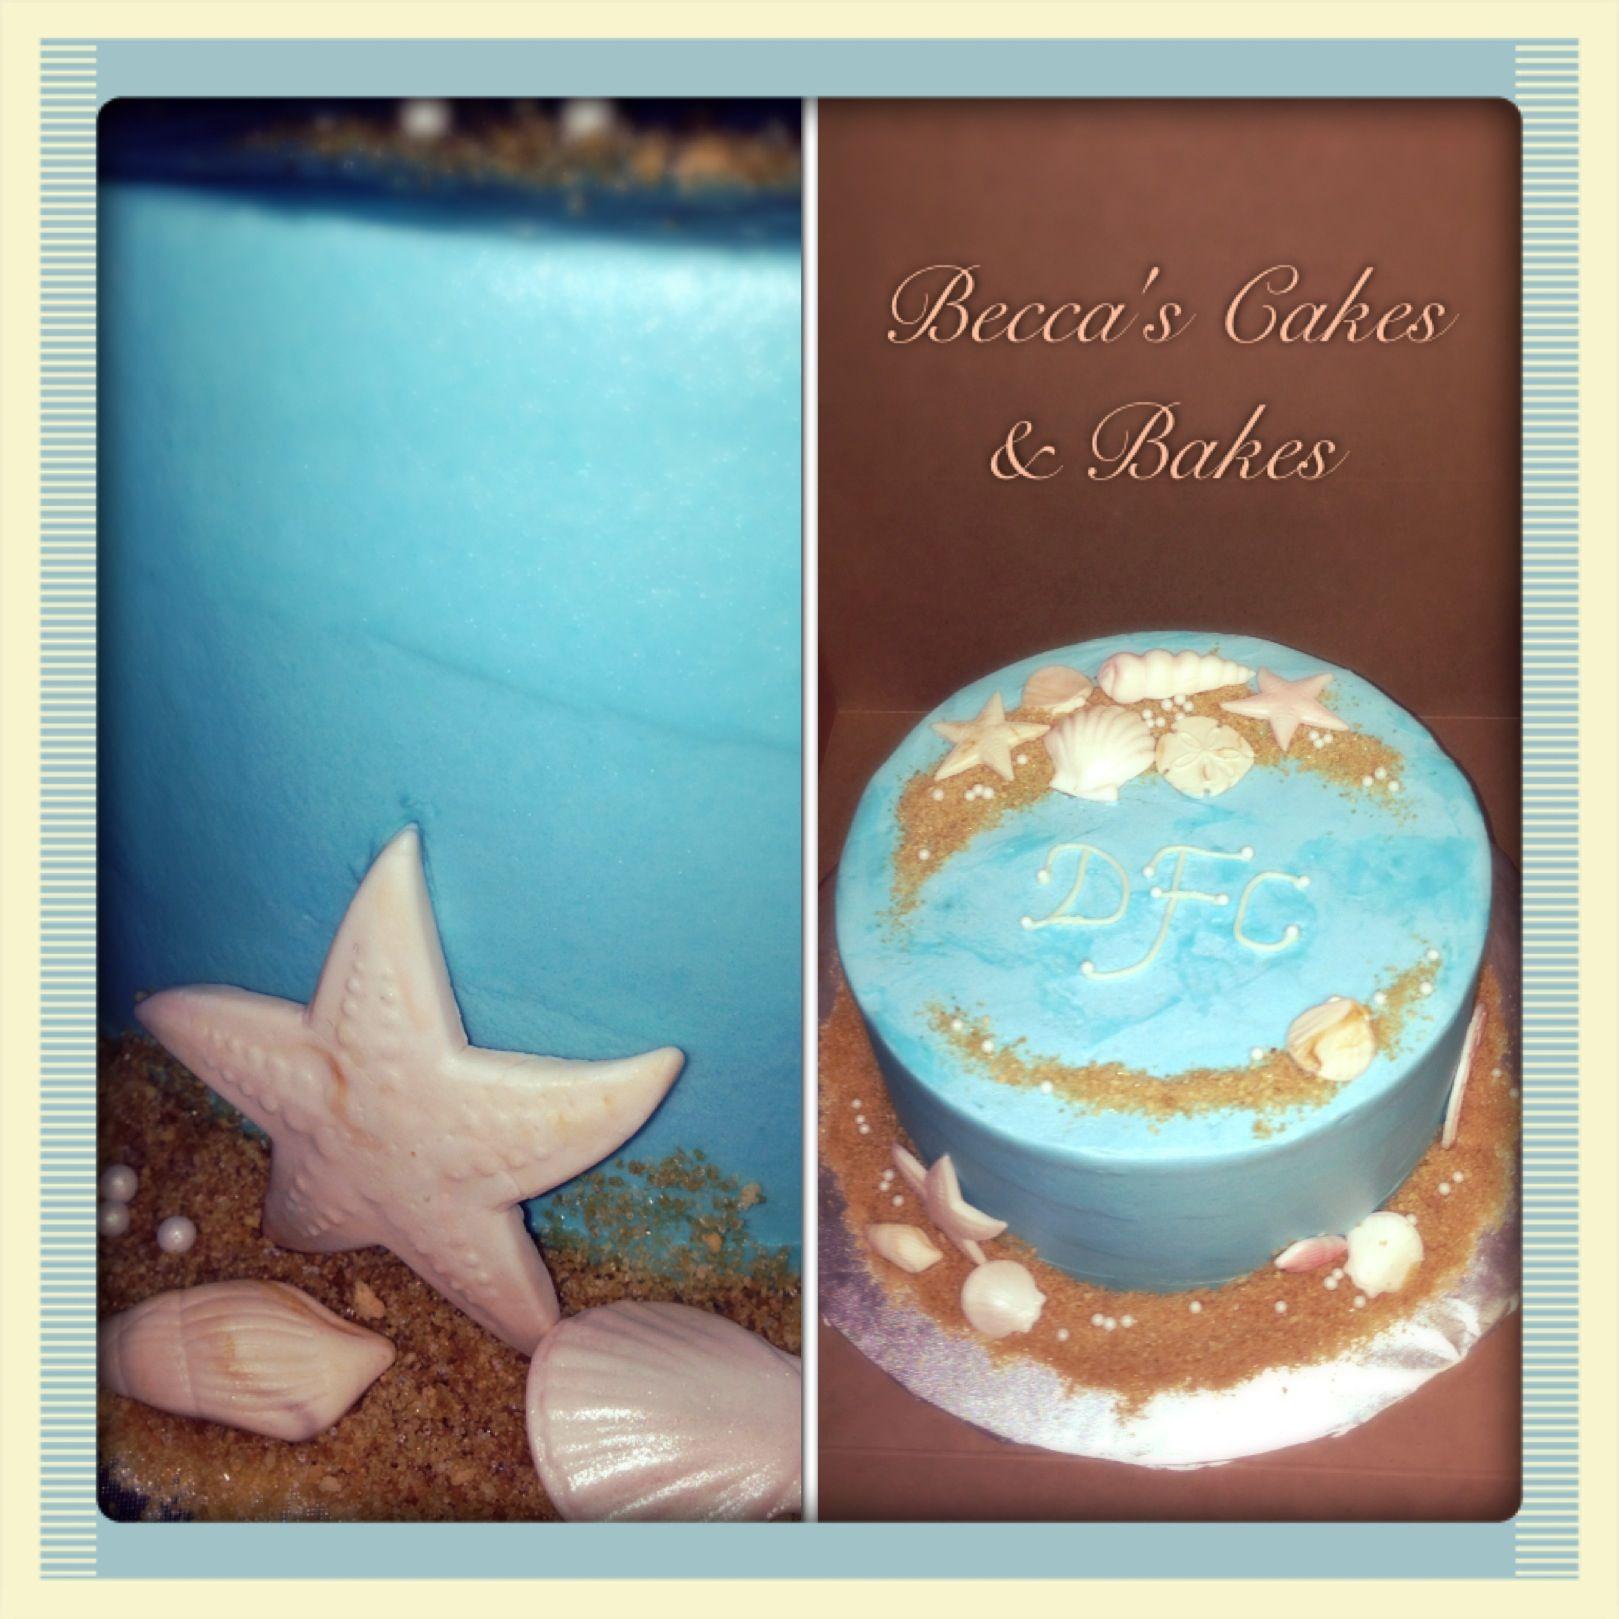 Simple Wedding Cupcake Ideas: Simple And Small Beach Wedding Cake